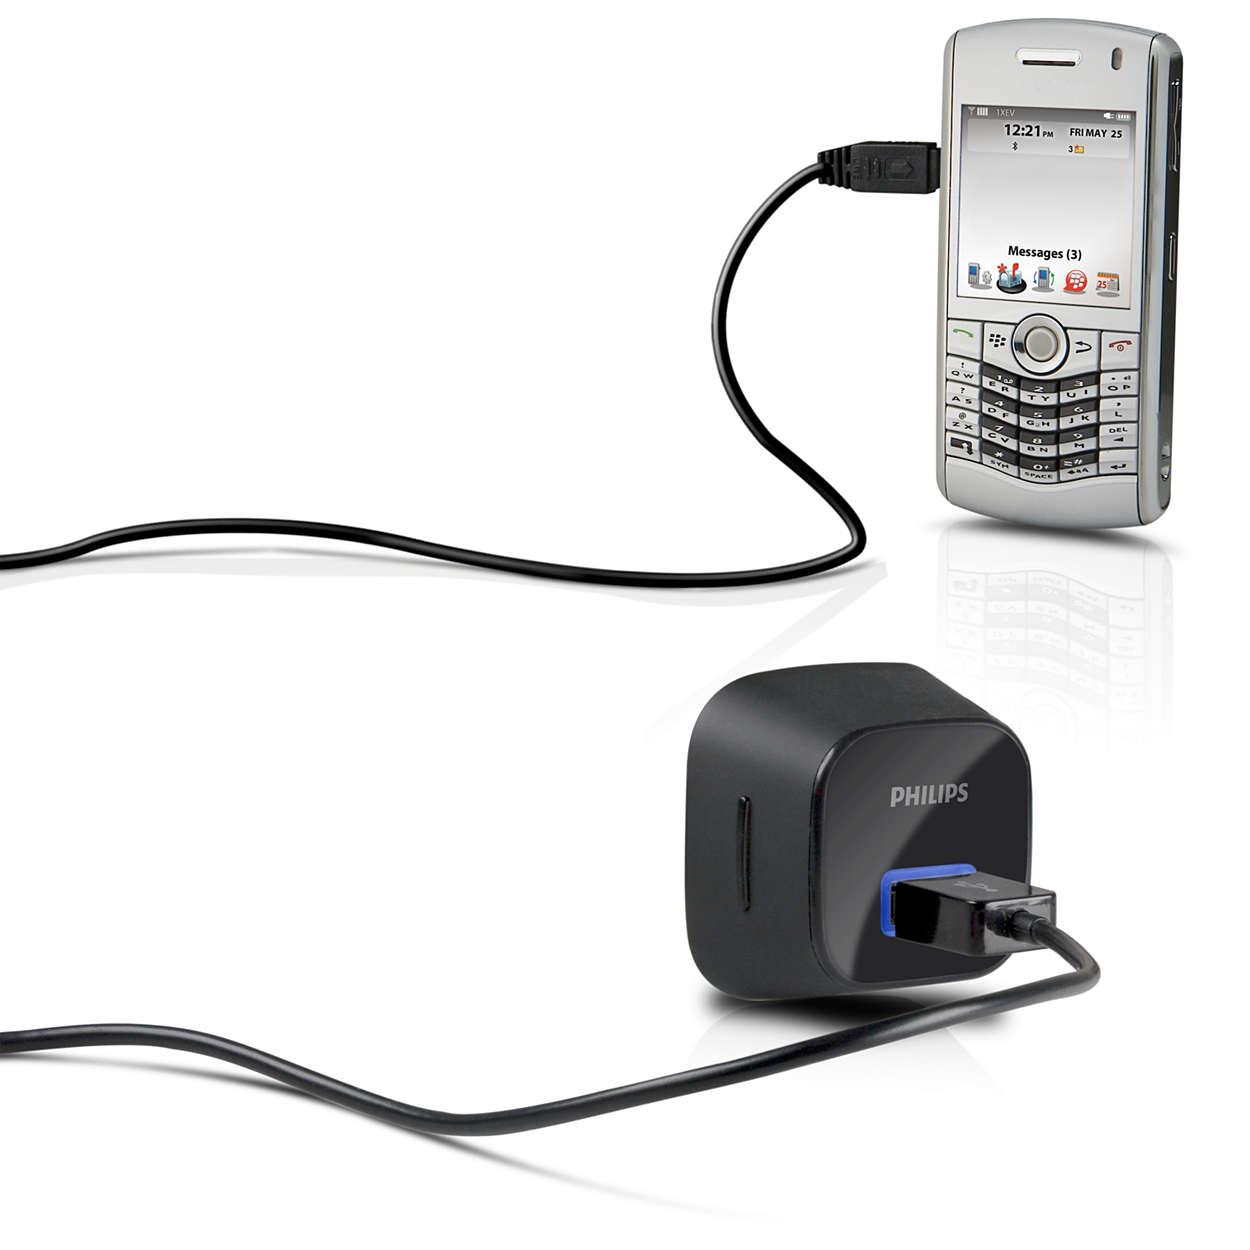 Mantén tu teléfono móvil cargado